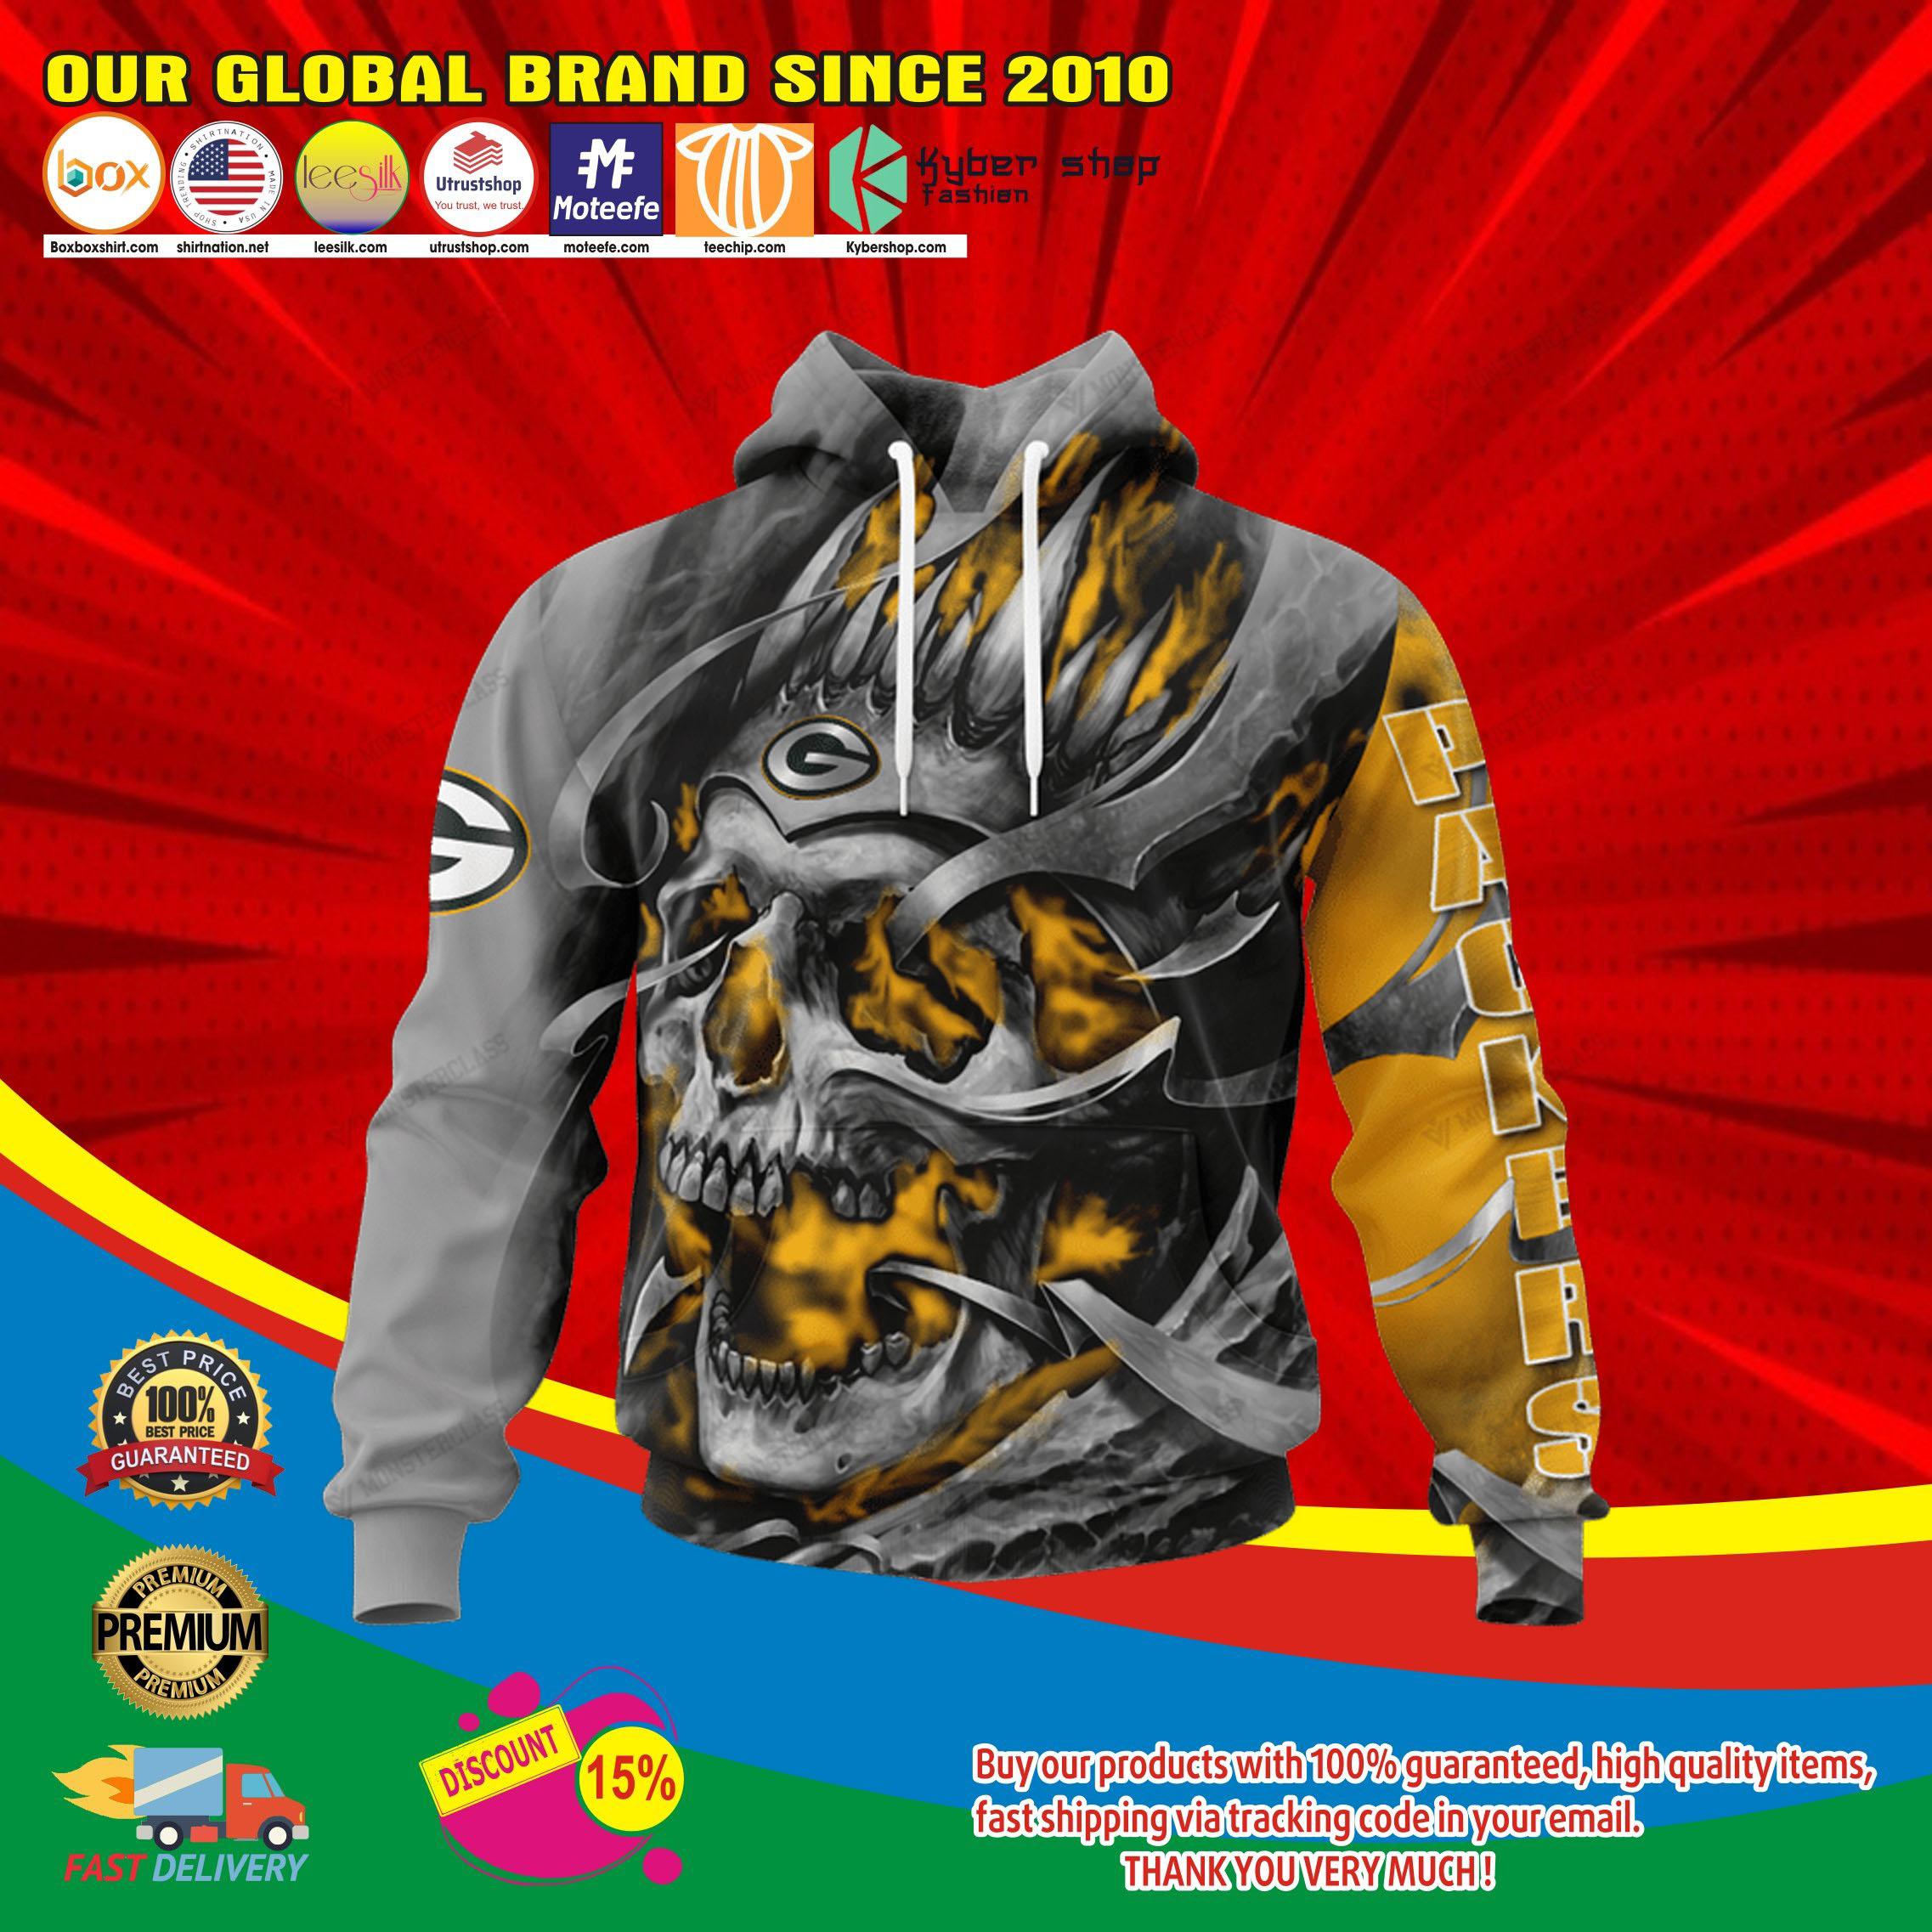 Green bay packers skull jersey hoodie4